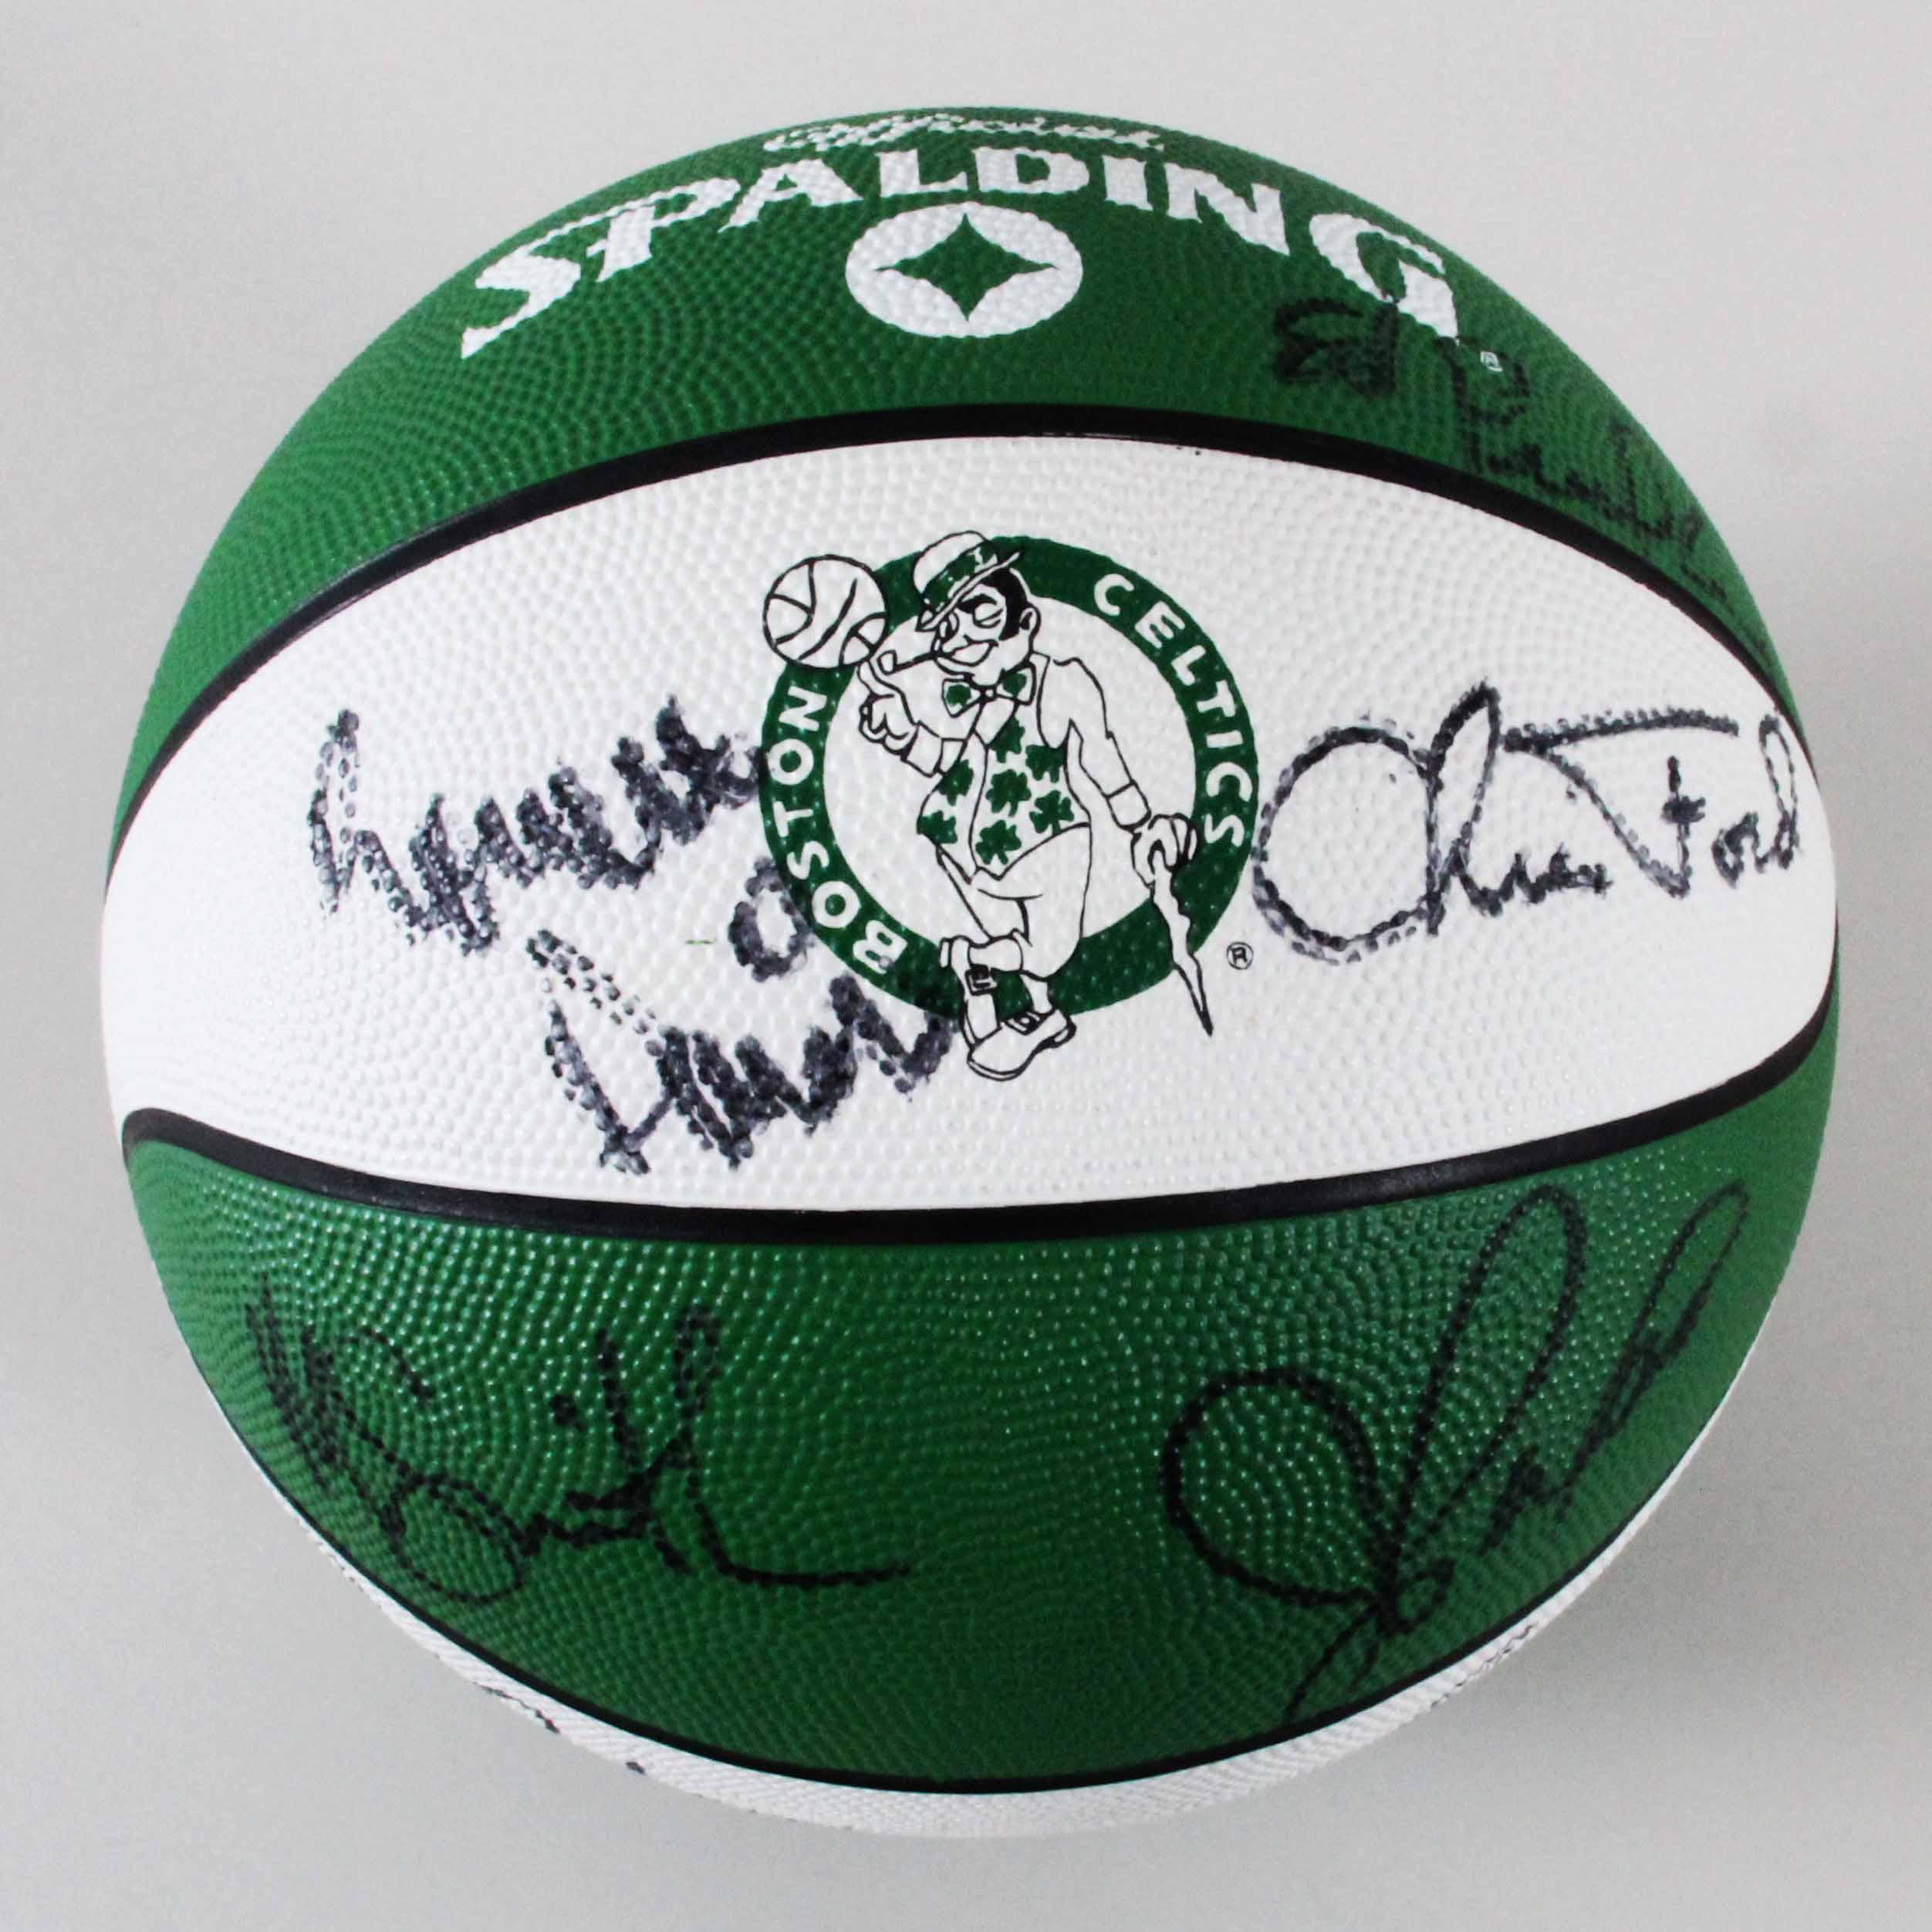 04a4a58ea 1989-90 Celtics Team-Signed Basketball Larry Bird